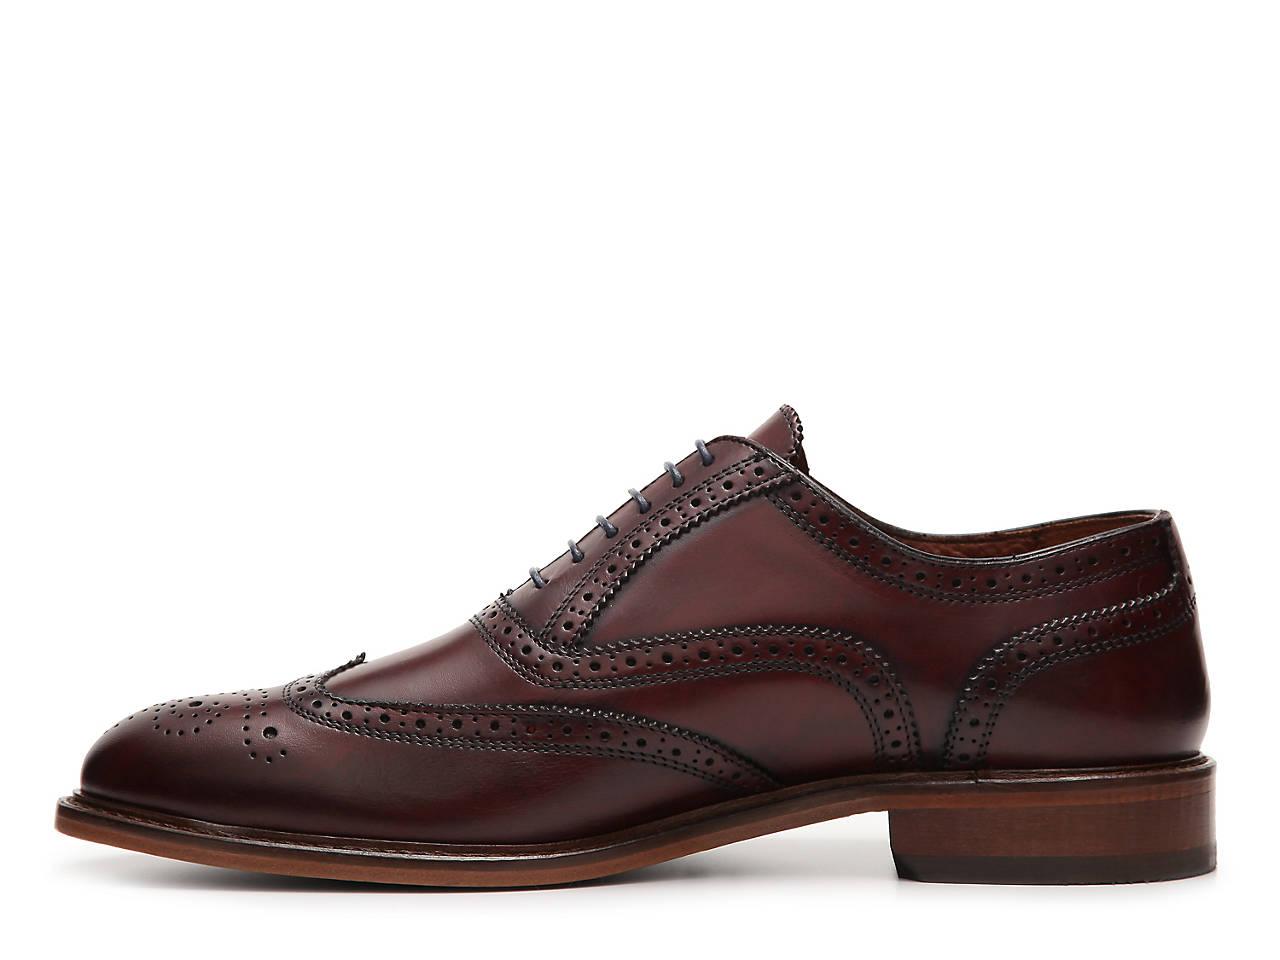 2bef41b8104 Mercanti Fiorentini Wingtip Oxford Men s Shoes